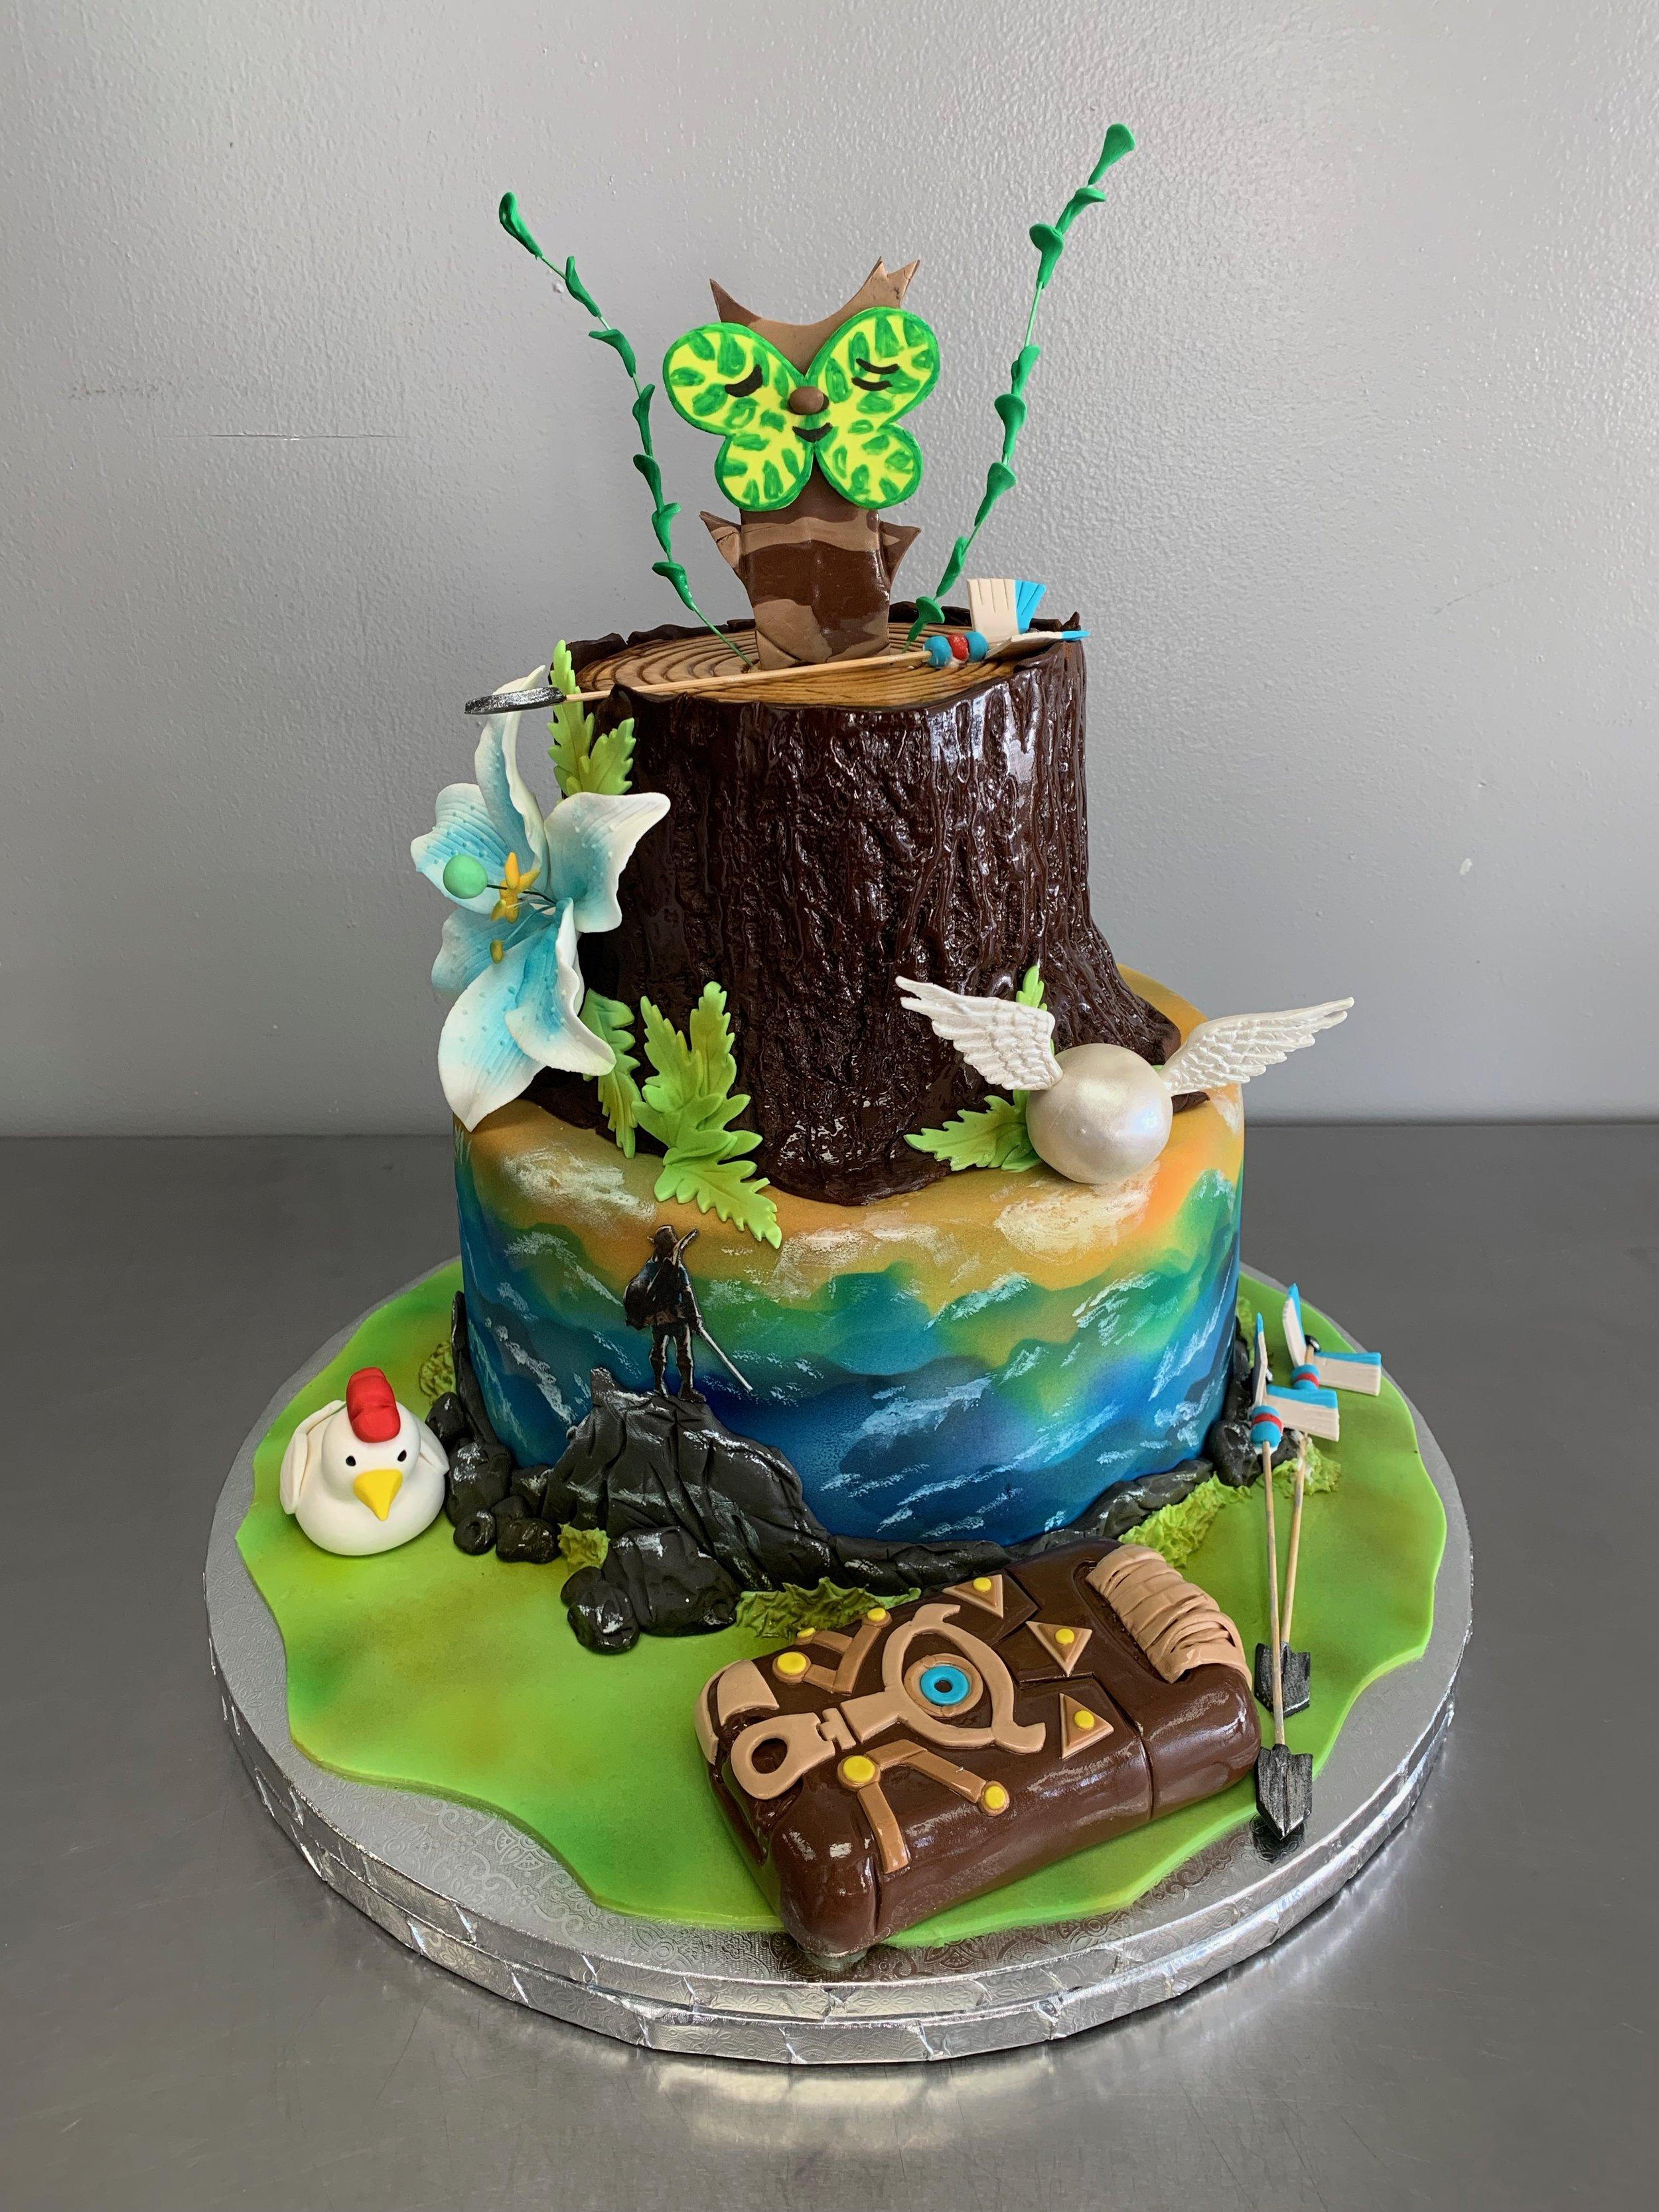 The Legend Of Zelda Groom S Cake Skazka Desserts Bakery Nj Custom Birthday Cakes Cupcakes Shop